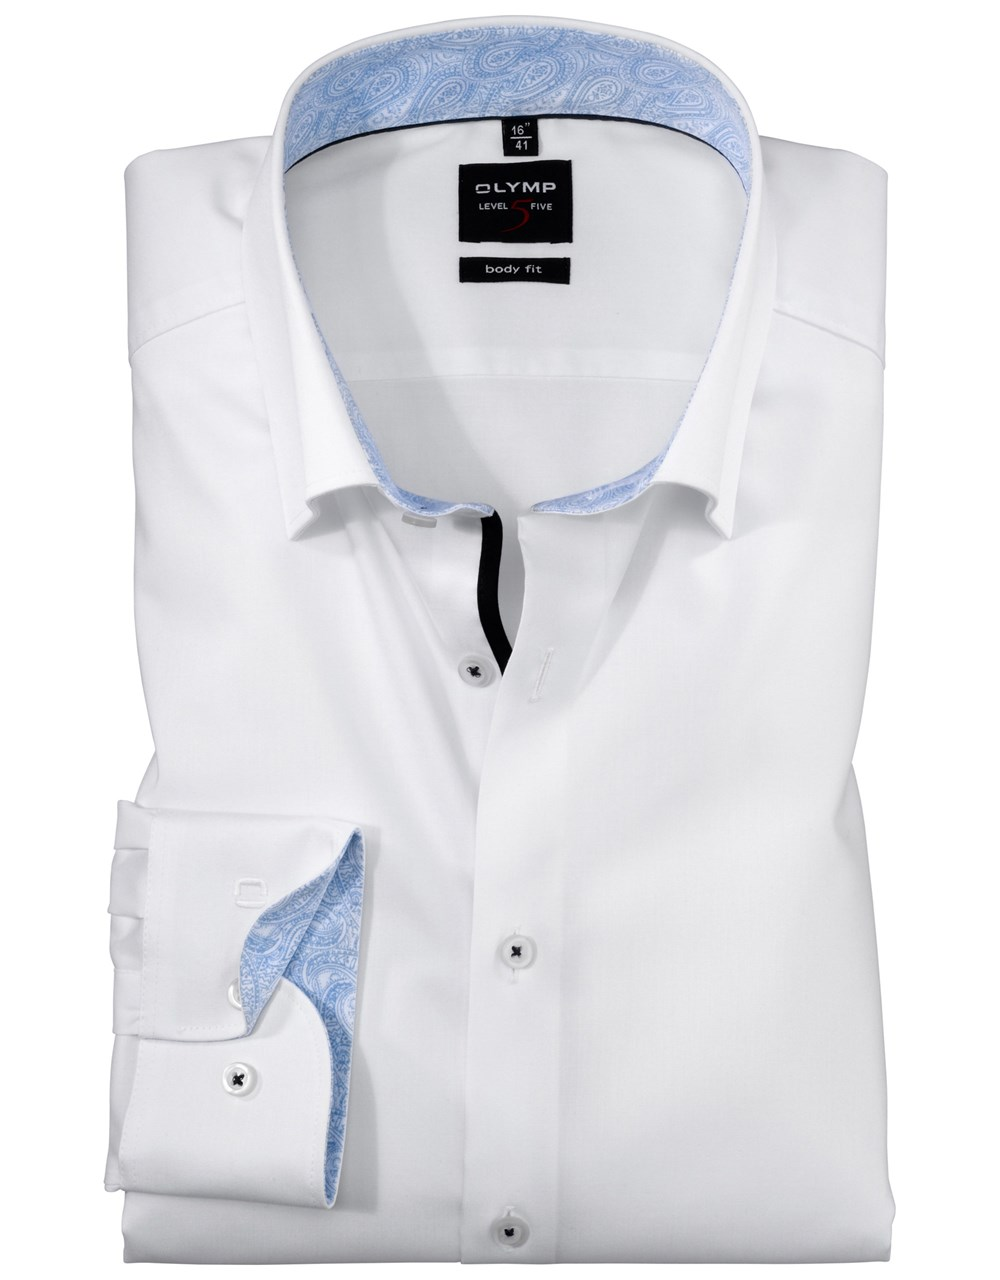 W M EGO. Olymp košile bílá 22c6ff3ea5